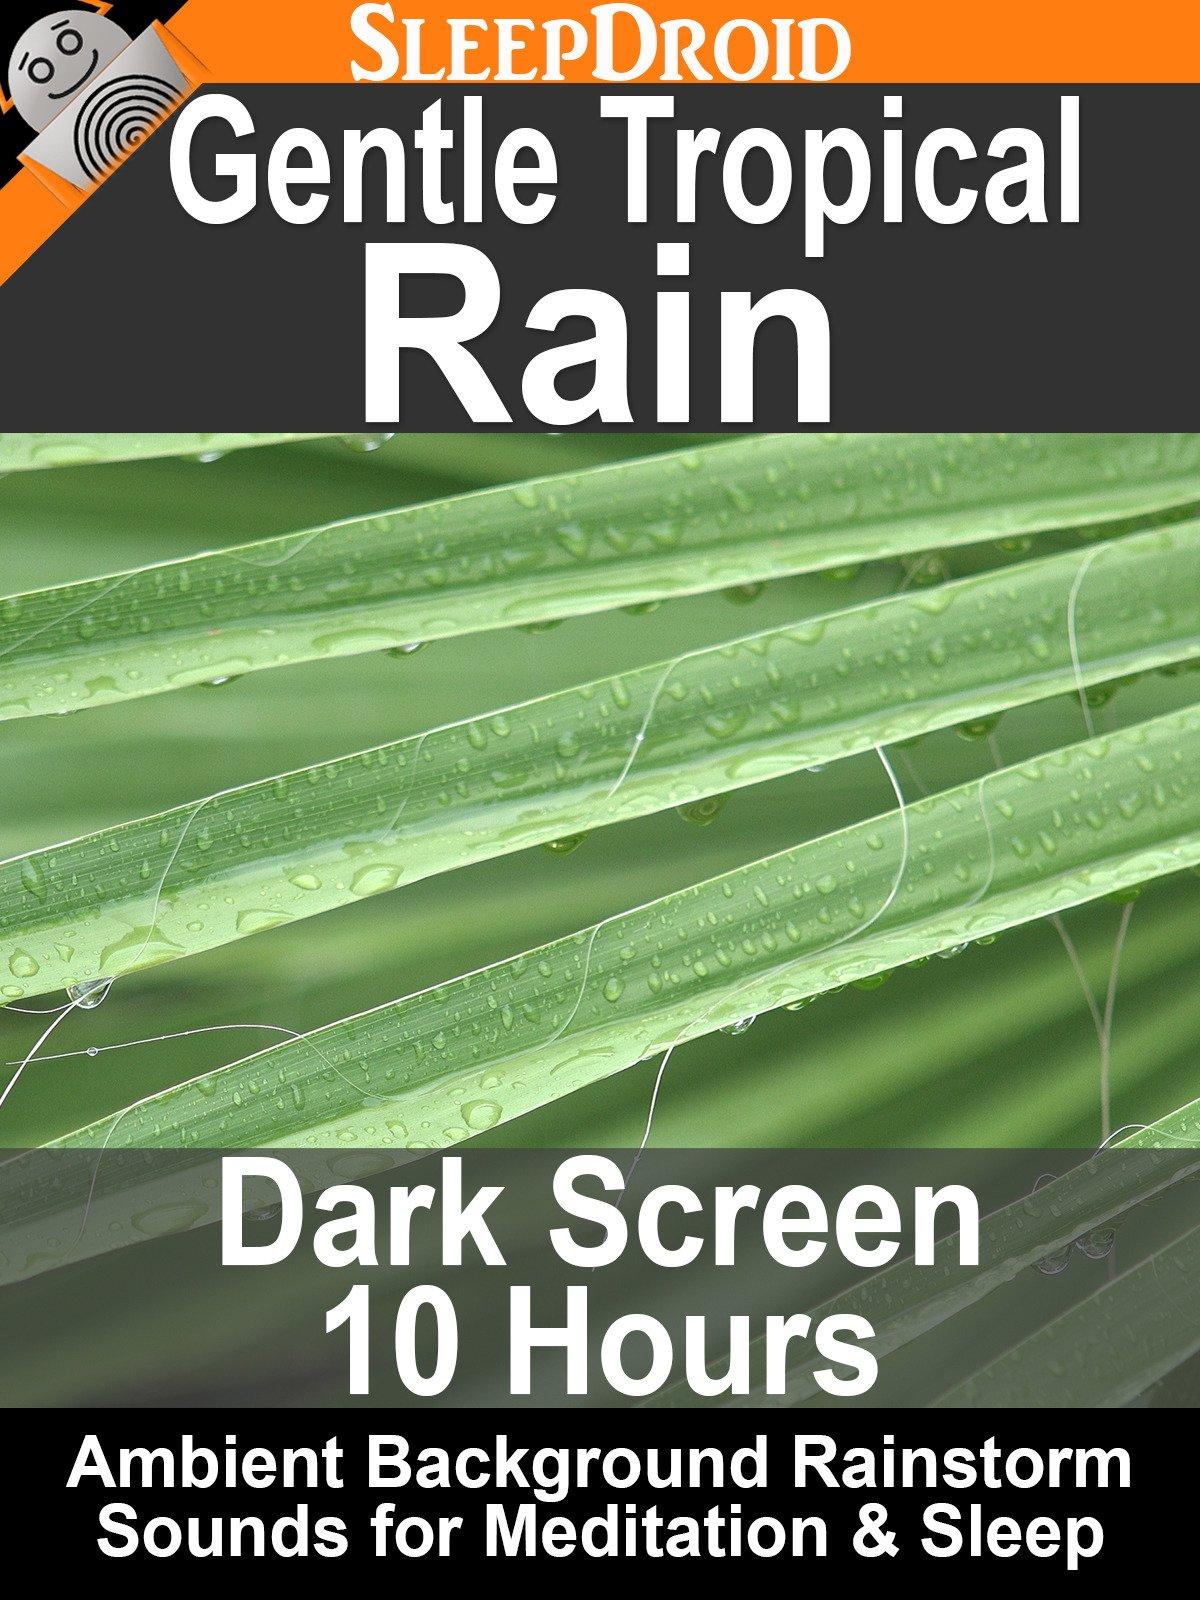 Gentle Tropical Rain: Dark Screen 10 Hours Ambient Background Rainstorm Sounds for Meditation & Sleep